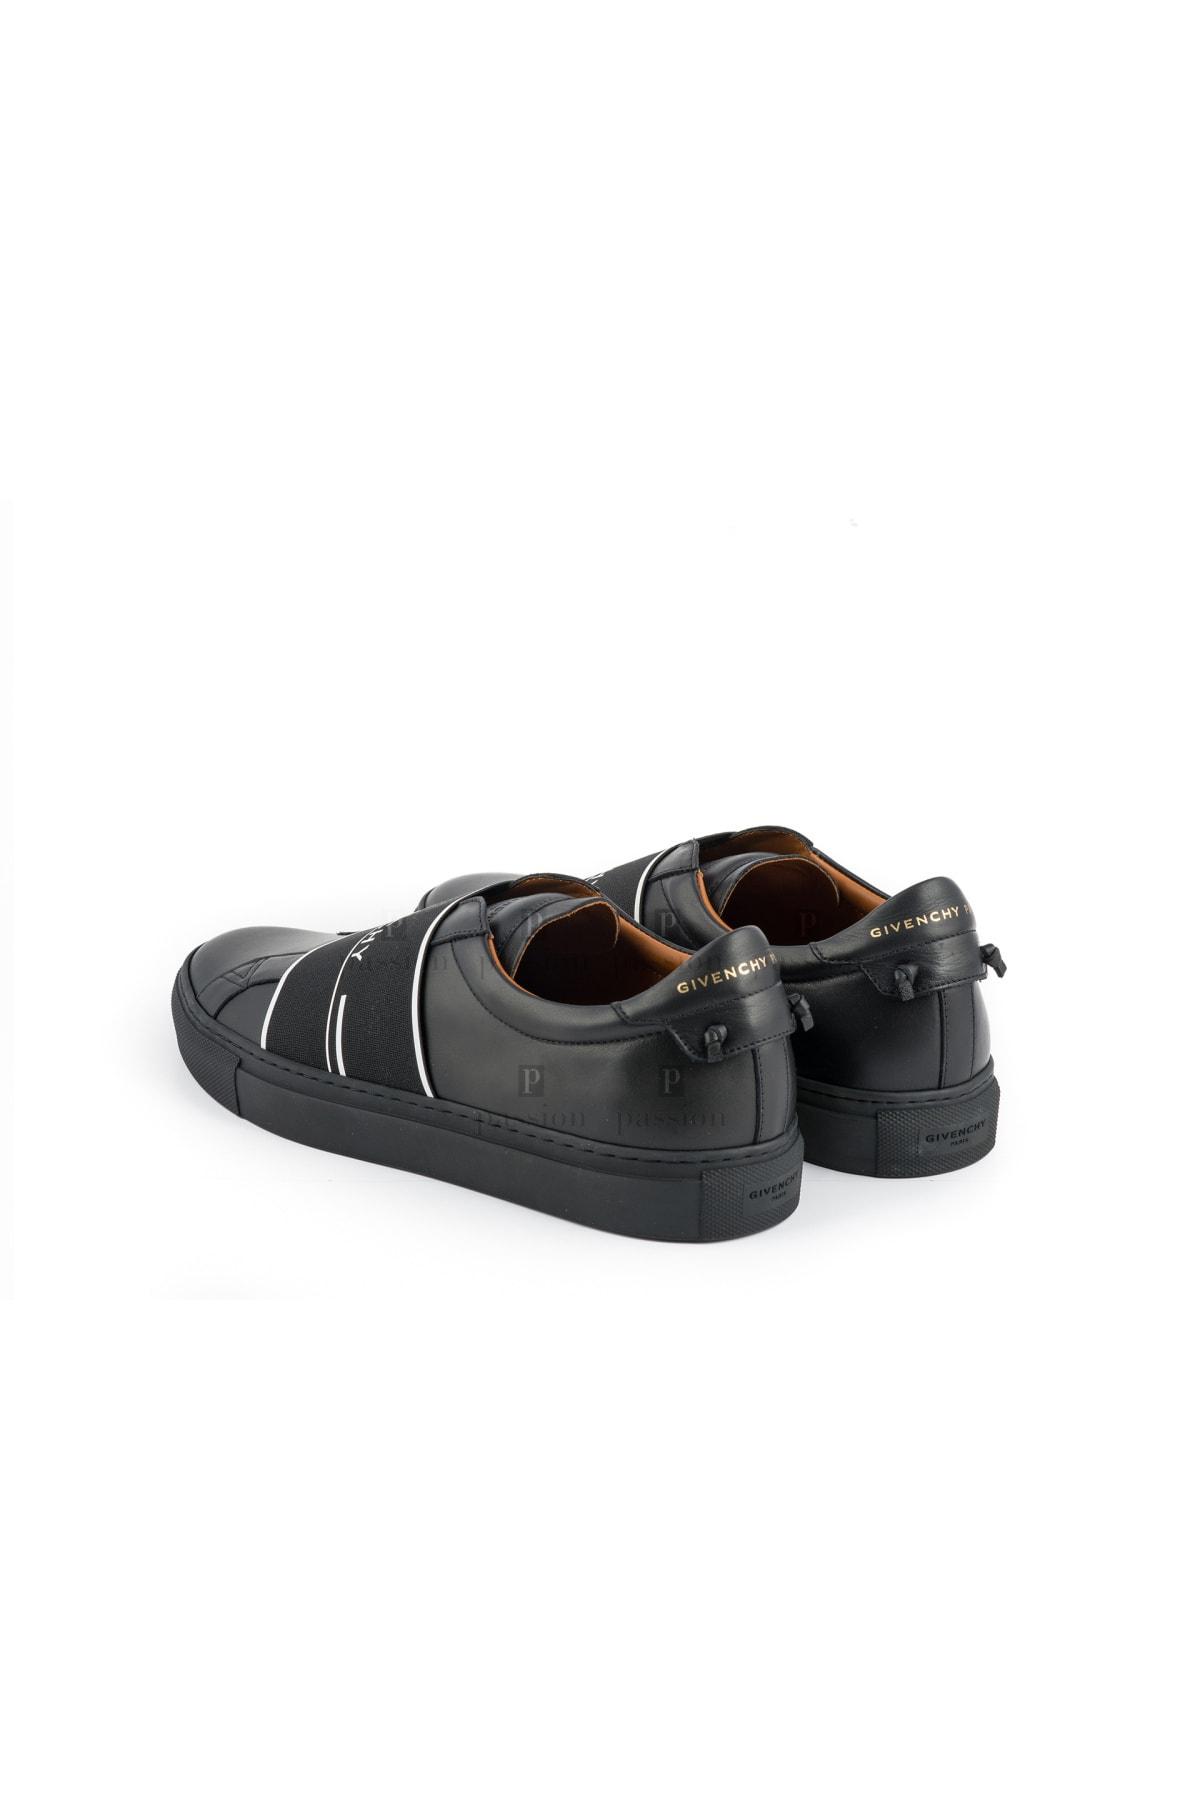 Givenchy Erkek Siyah Deri Sneaker 1